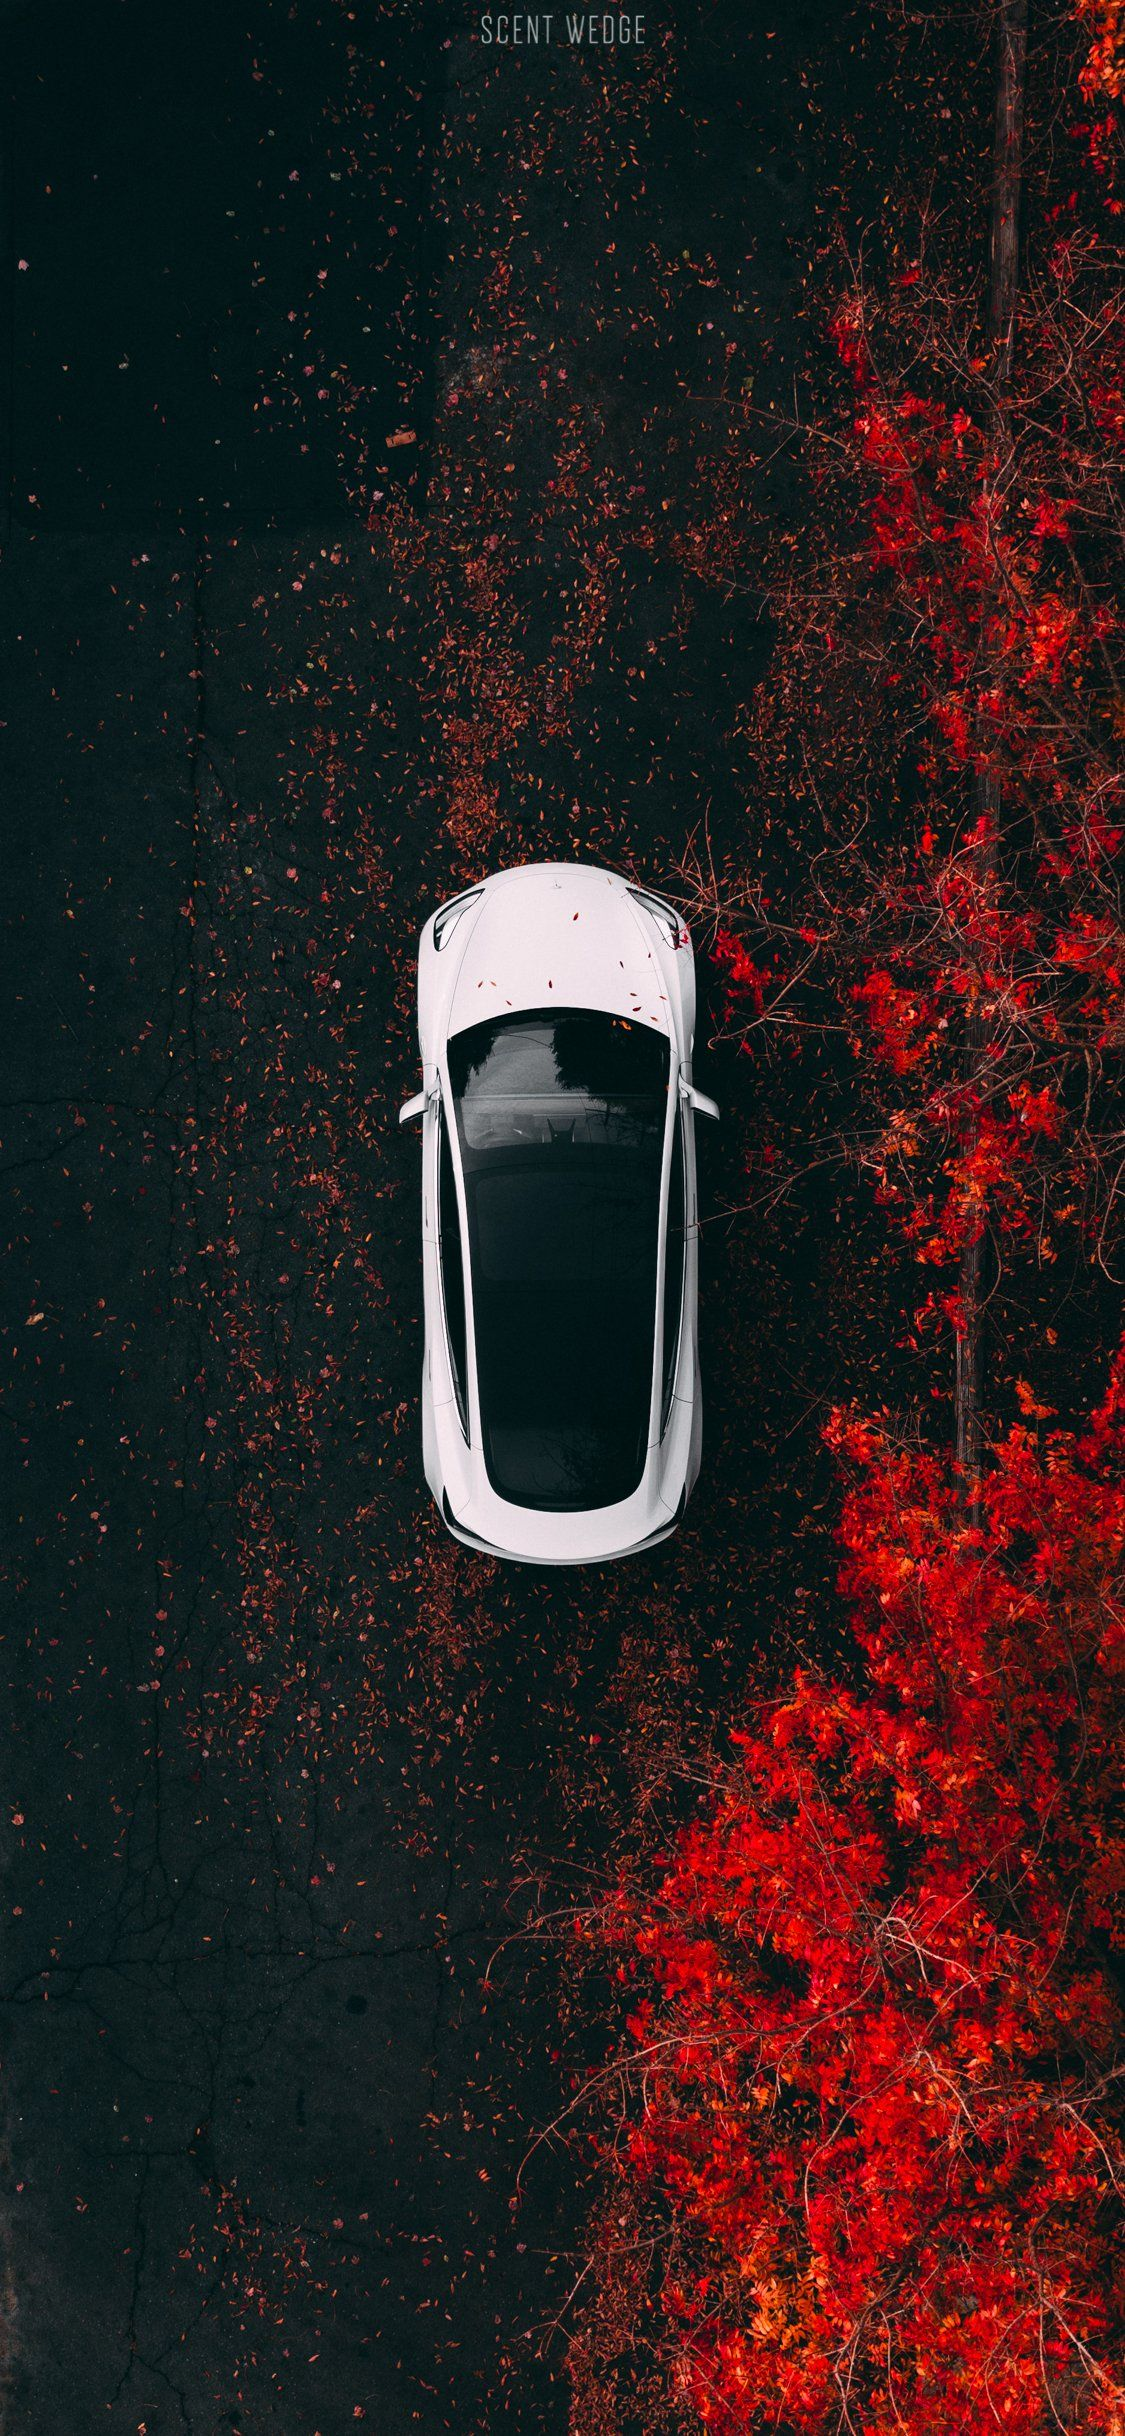 Tesla Model 3 Iphone Wallpapers Top Free Tesla Model 3 Iphone Backgrounds Wallpaperaccess